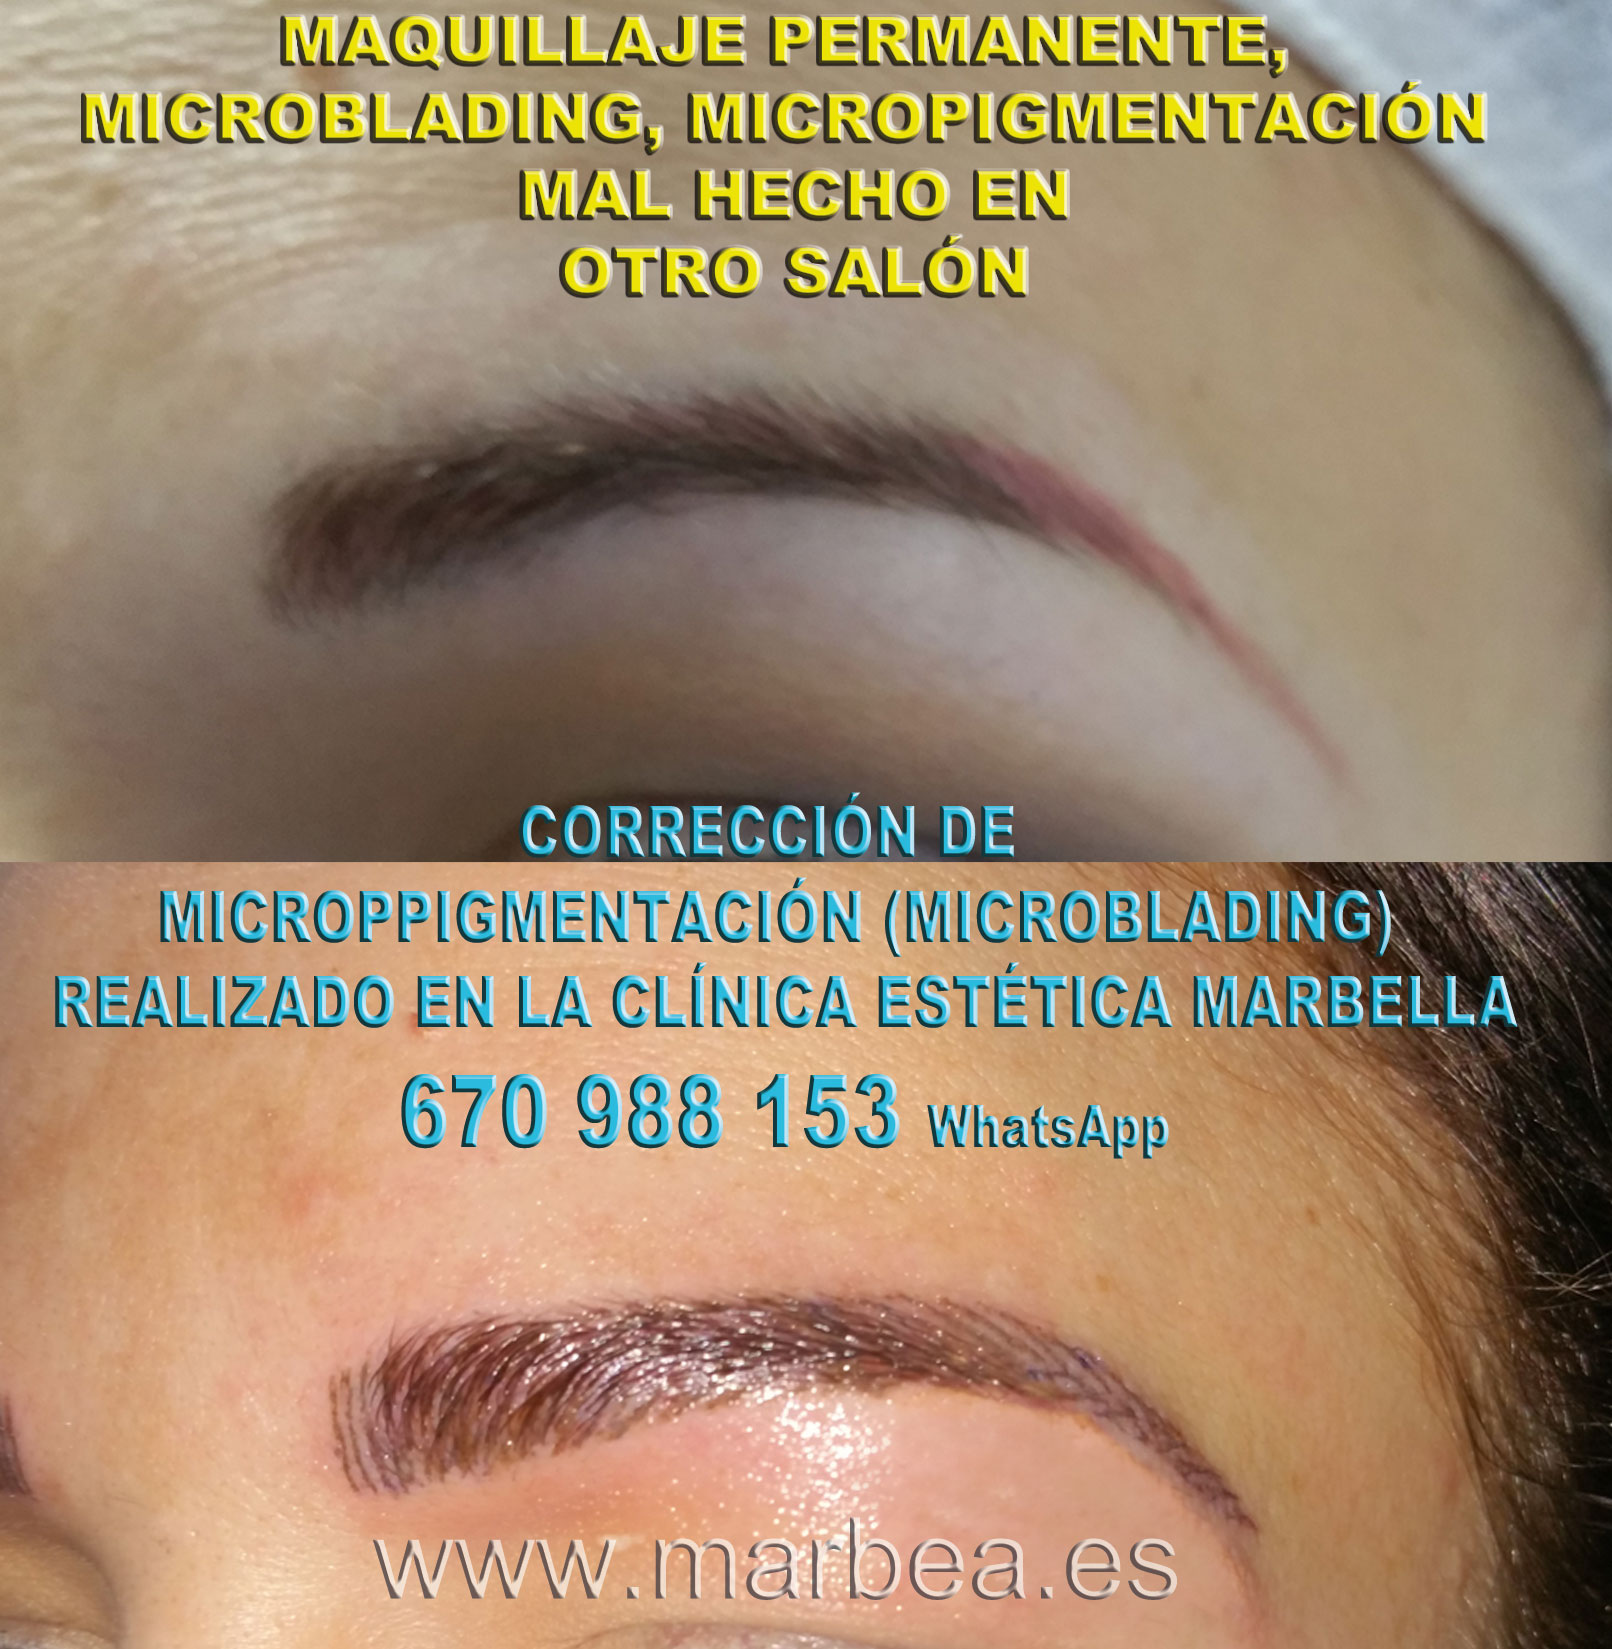 ELIMINAR TATUAJE CEJAS clínica estética tatuaje propone eliminar la micropigmentación de cejas,corregir micropigmentación no deseada